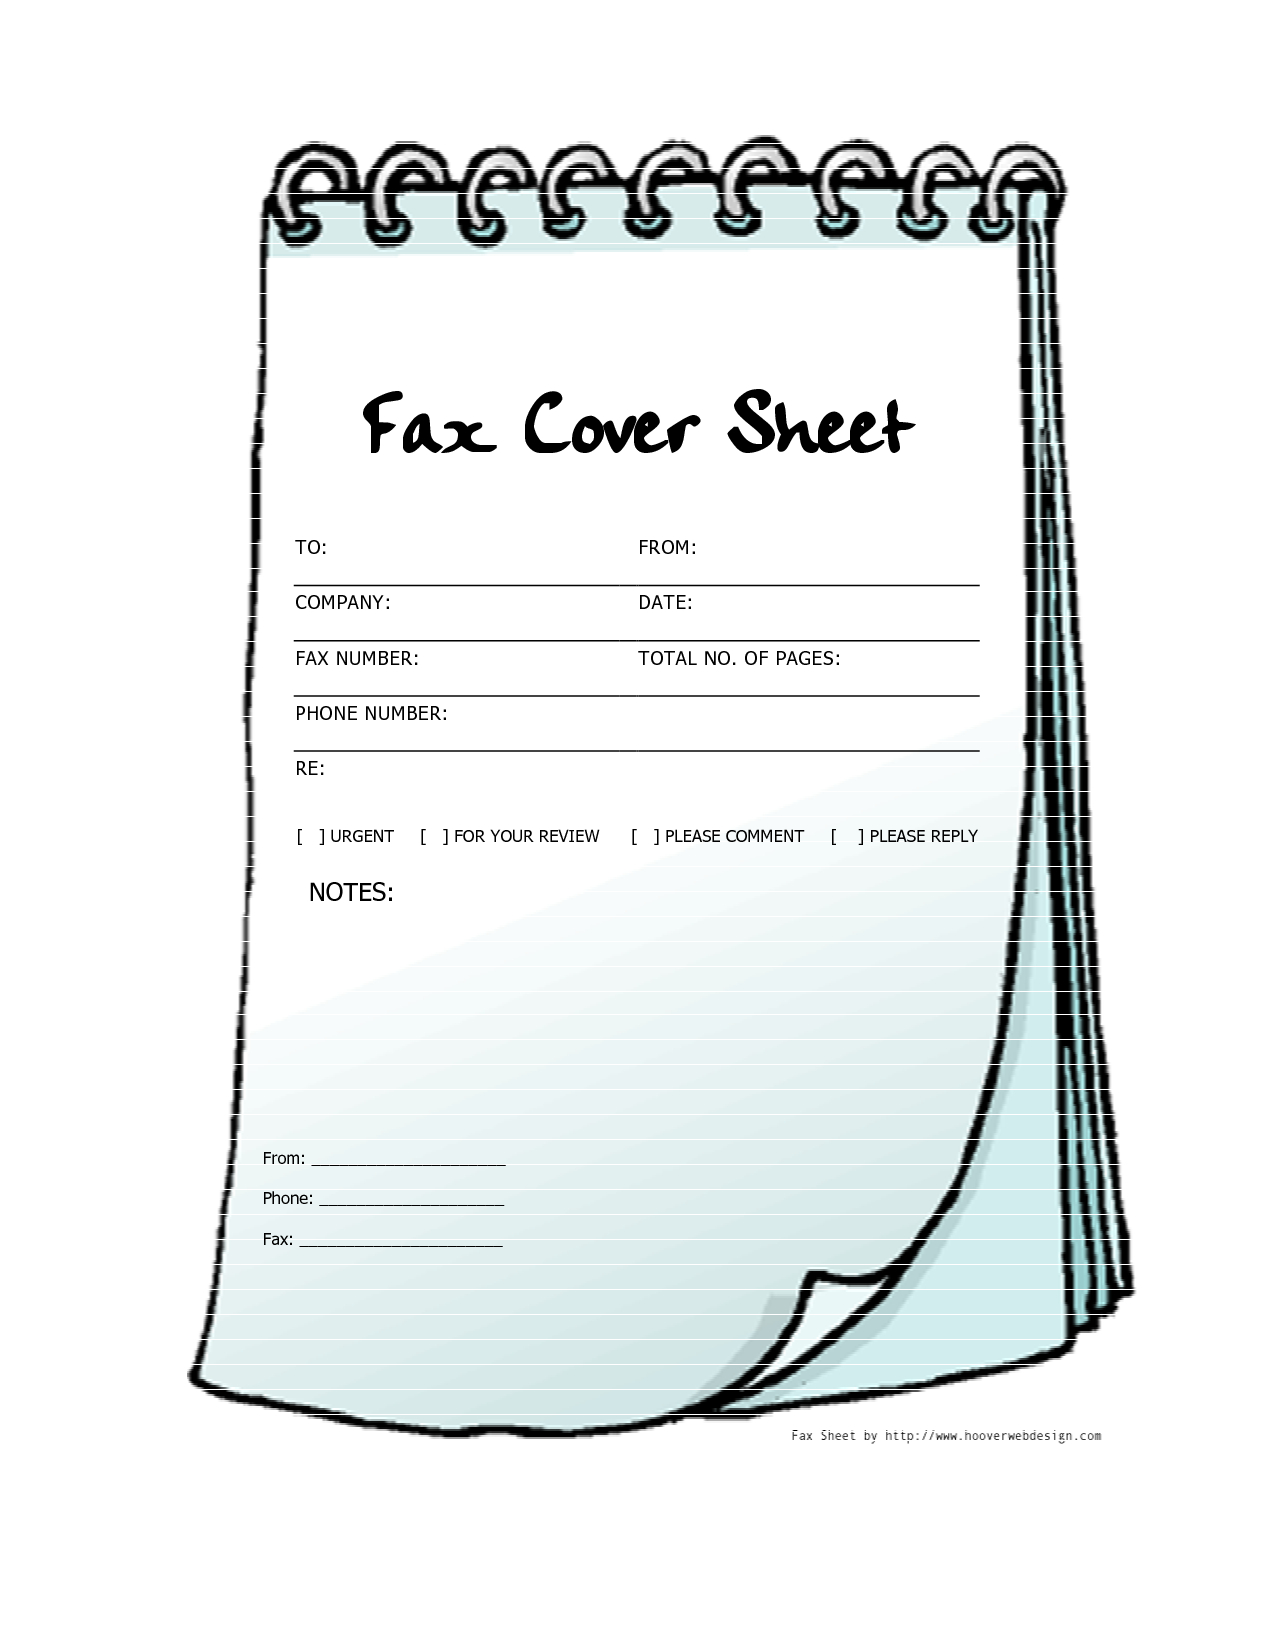 Free Printable Fax Cover Sheets | Free Printable Fax Cover Sheet - Free Printable Fax Cover Sheet Pdf